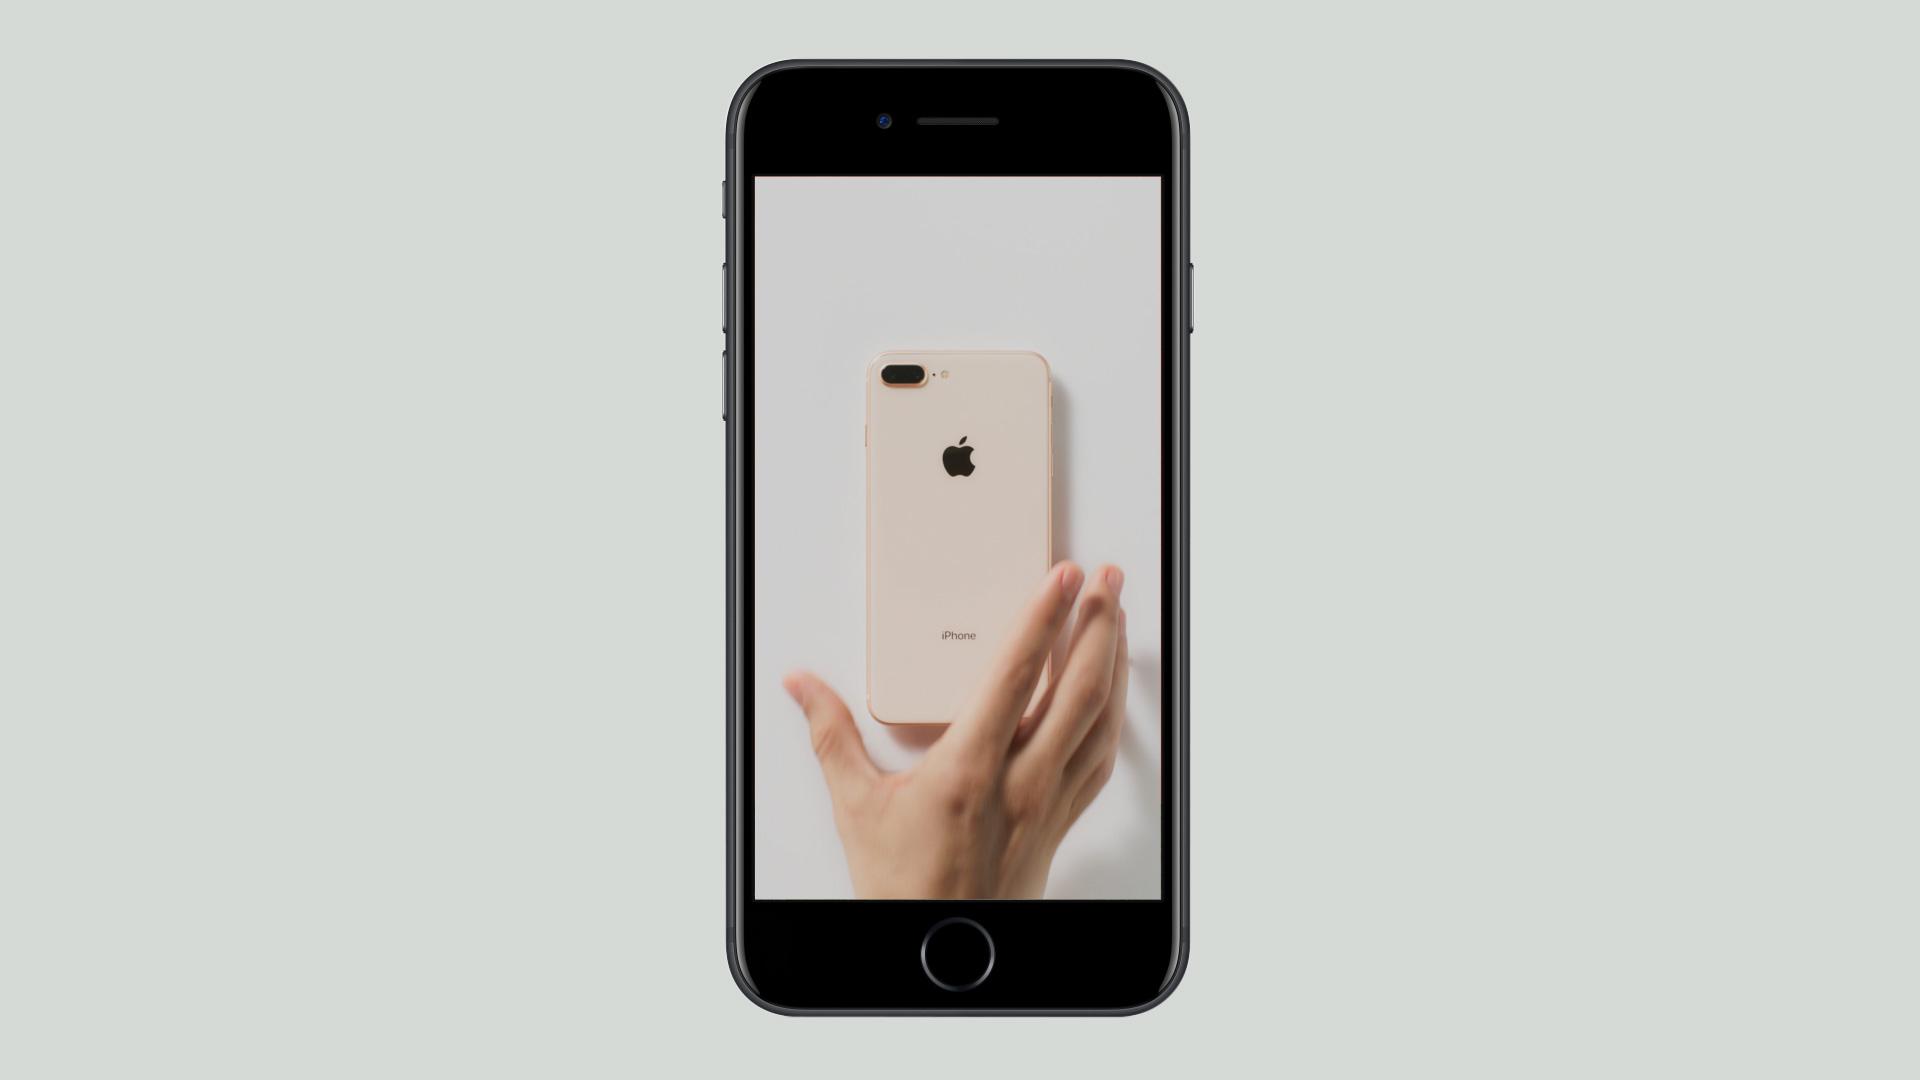 iphone_portrait_device_overlay_01_00420.jpg